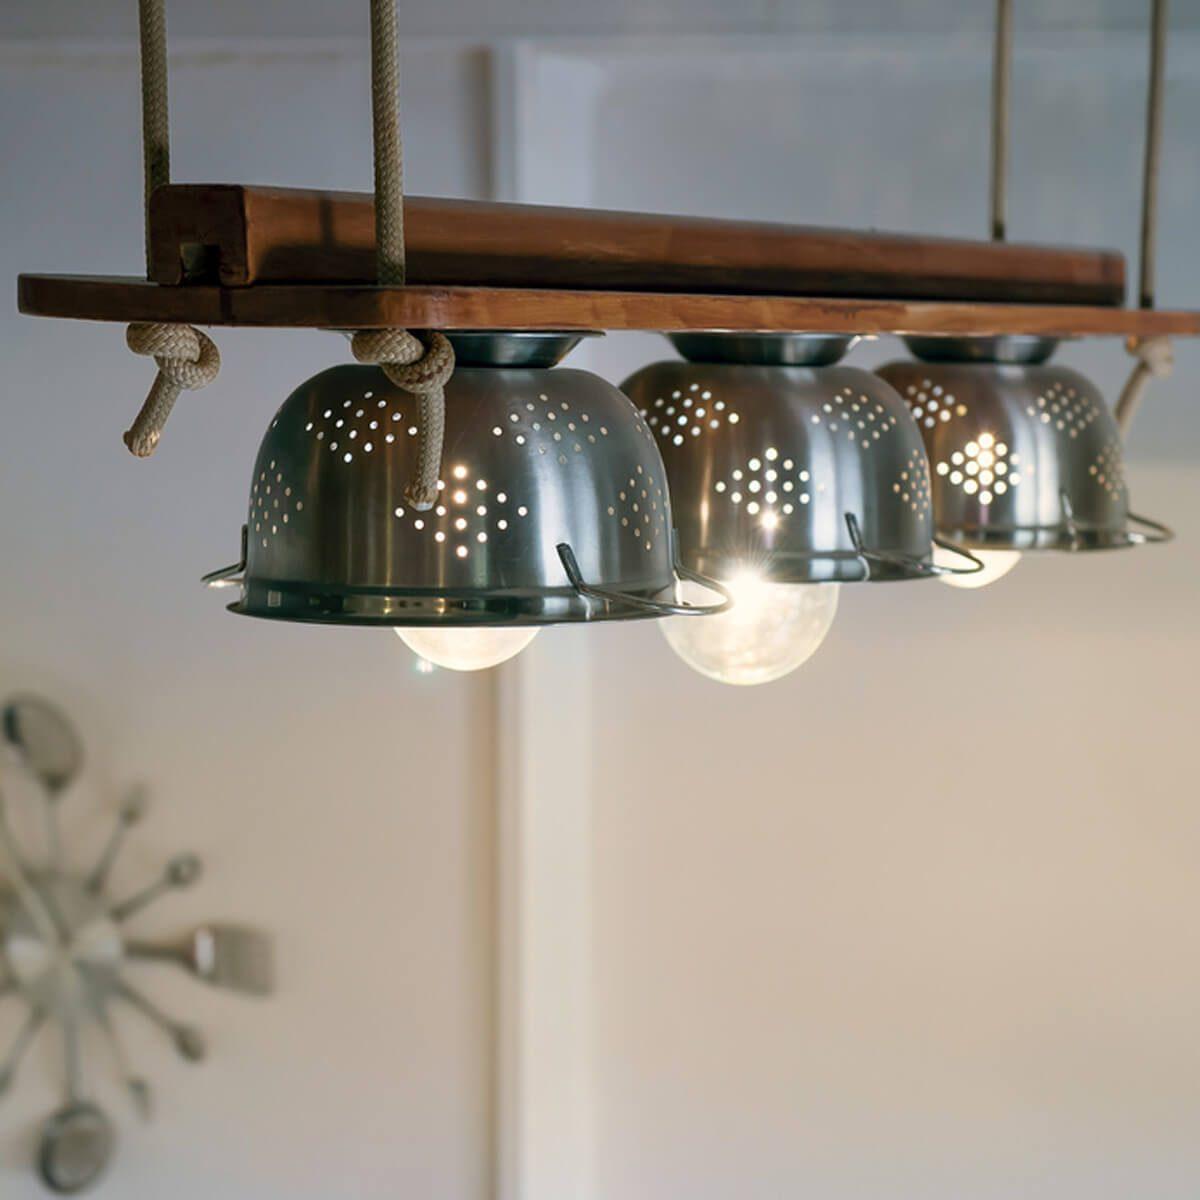 kitchen lighting colander bowls